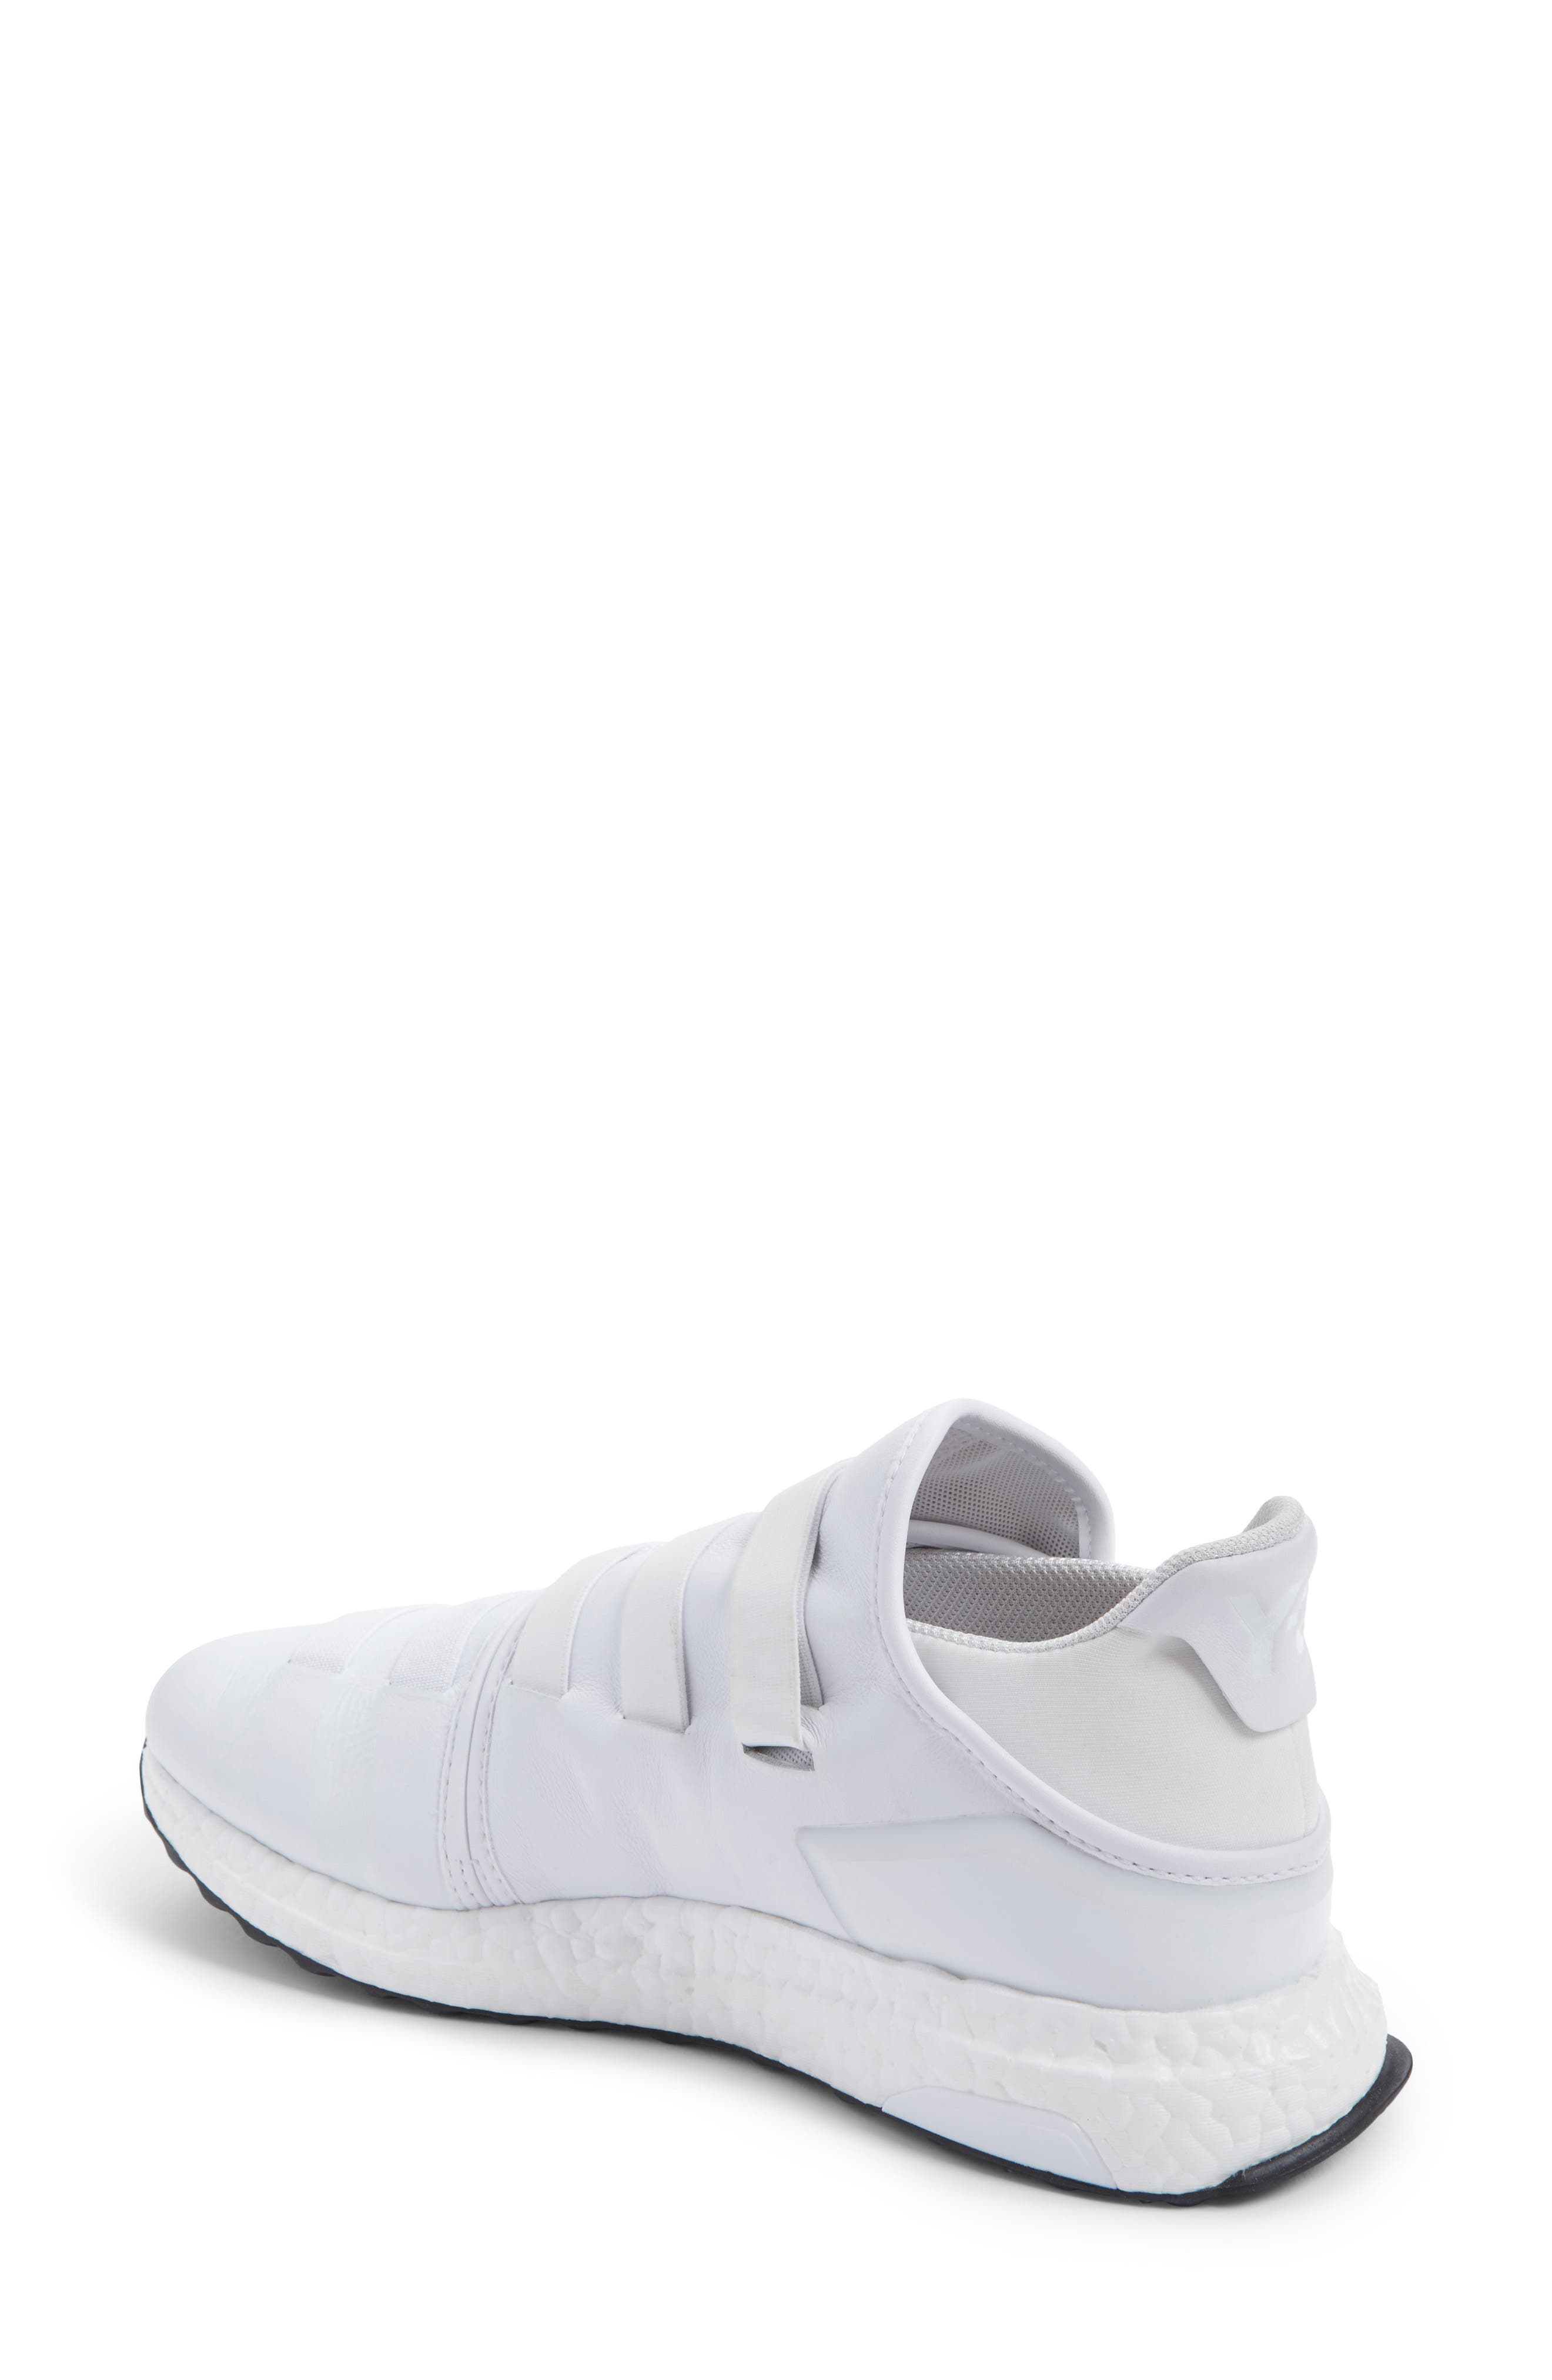 Zazu Strappy Sneaker,                             Alternate thumbnail 2, color,                             100